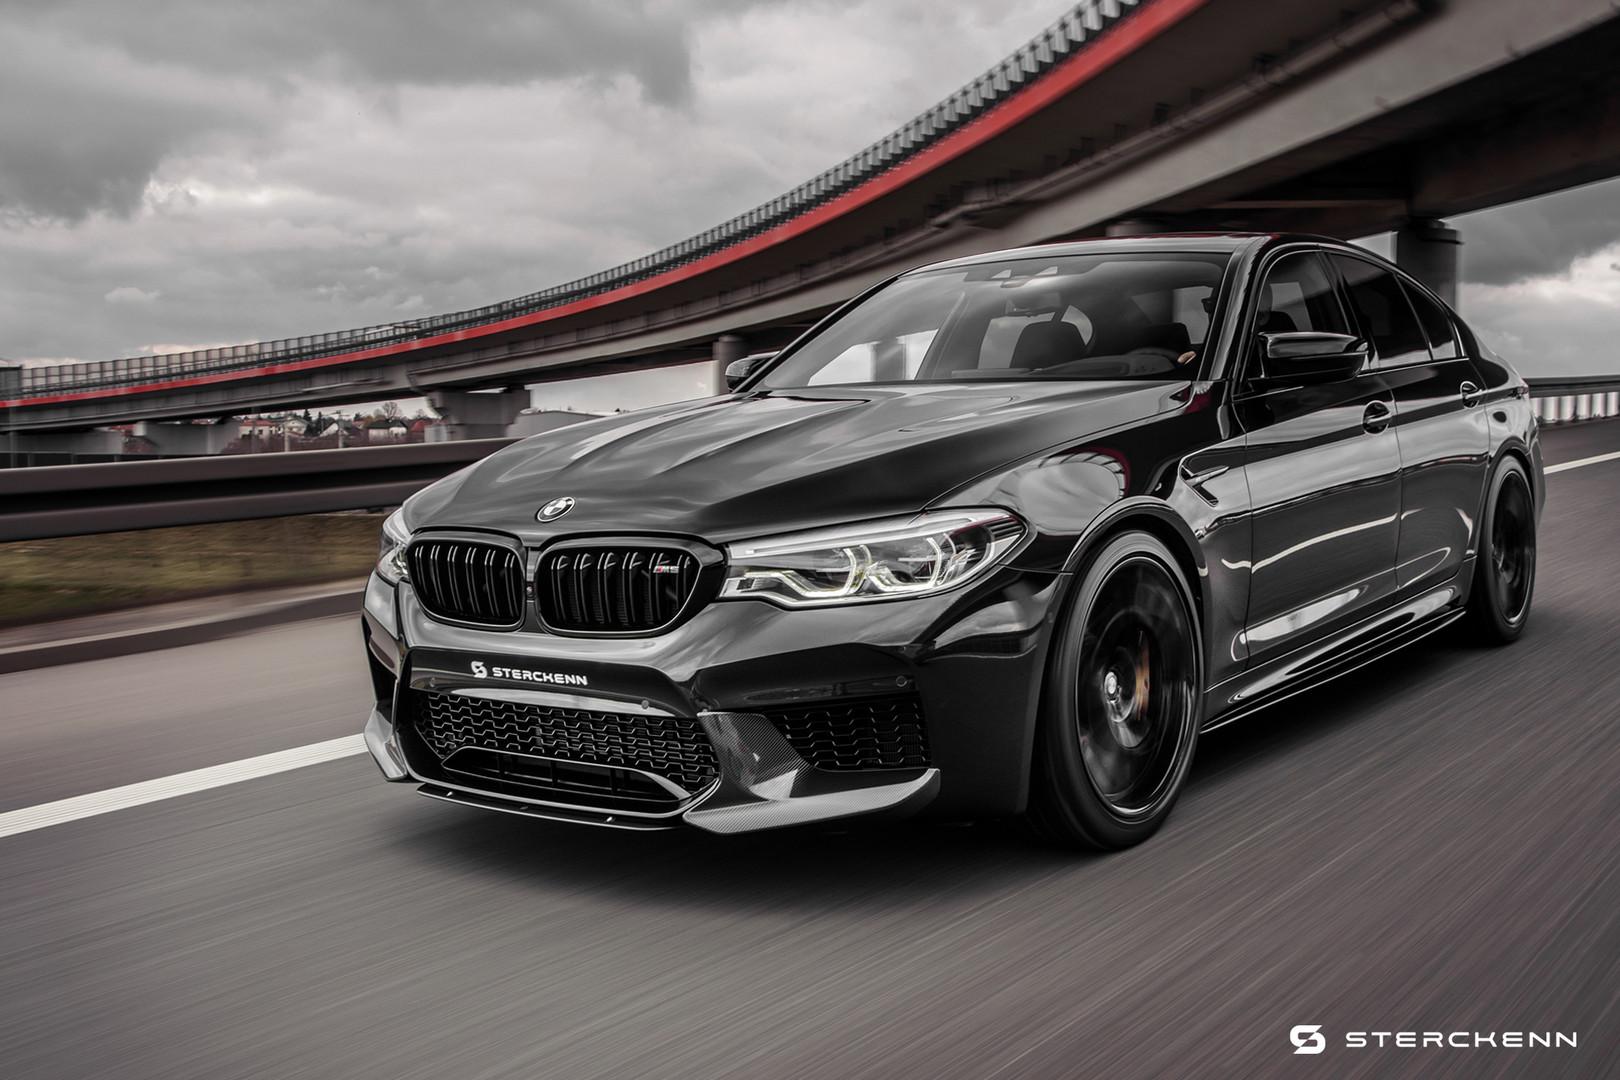 Ищете тонкий тюнинг-пакет для вашего BMW M5 или M2? Sterckenn вам поможет!